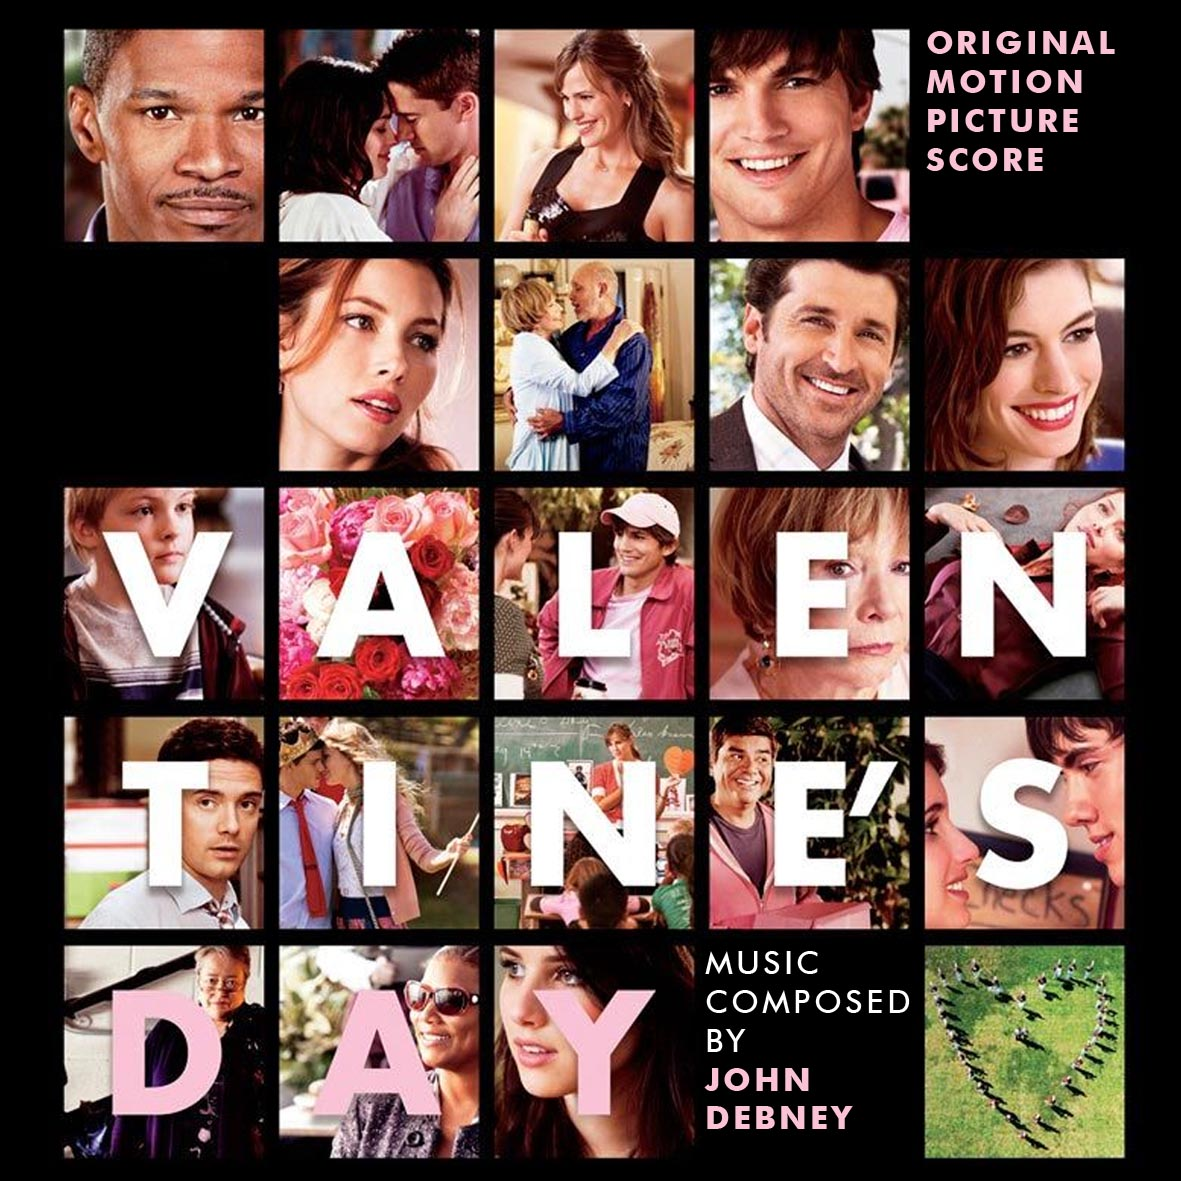 http://2.bp.blogspot.com/_NW50FBr1aeg/S8MwCH1U50I/AAAAAAAABwI/_2OnoUZjzyE/s1600/valentines%2Bday%2Bfrontsmall.jpg